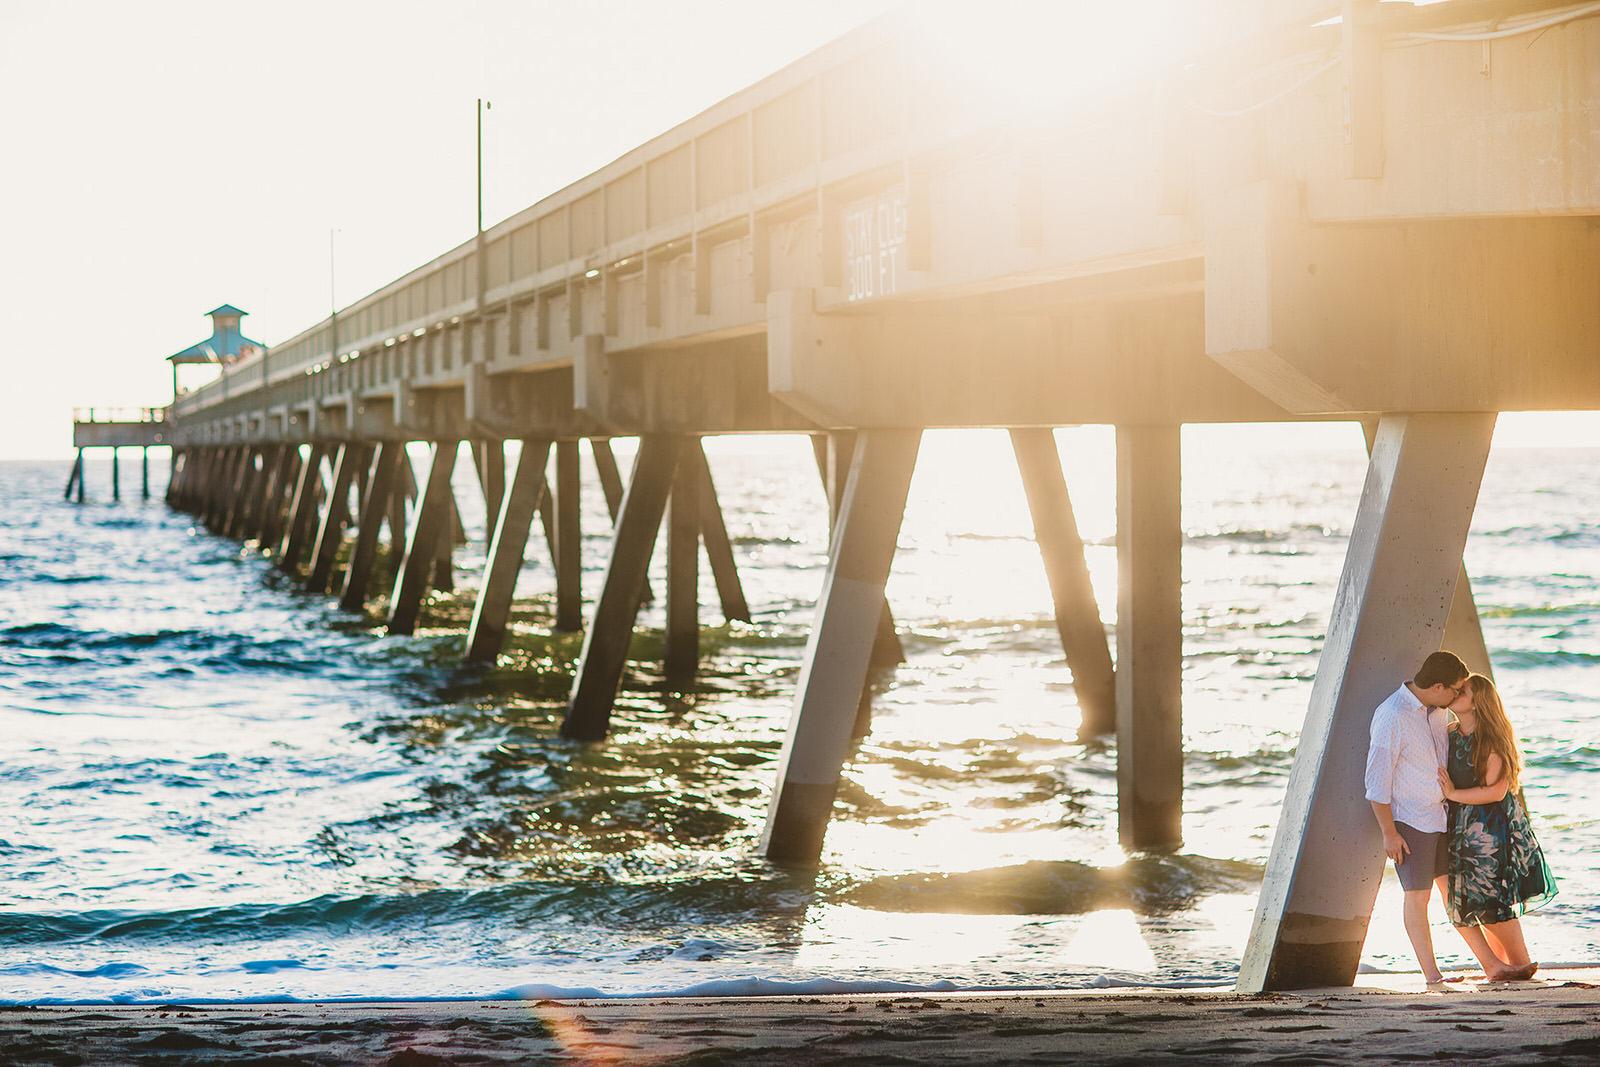 deerfield-beach-pier-engagment-session-engaged-getting-married-sunrise-beauty-ocean-beach-couple-love.jpg